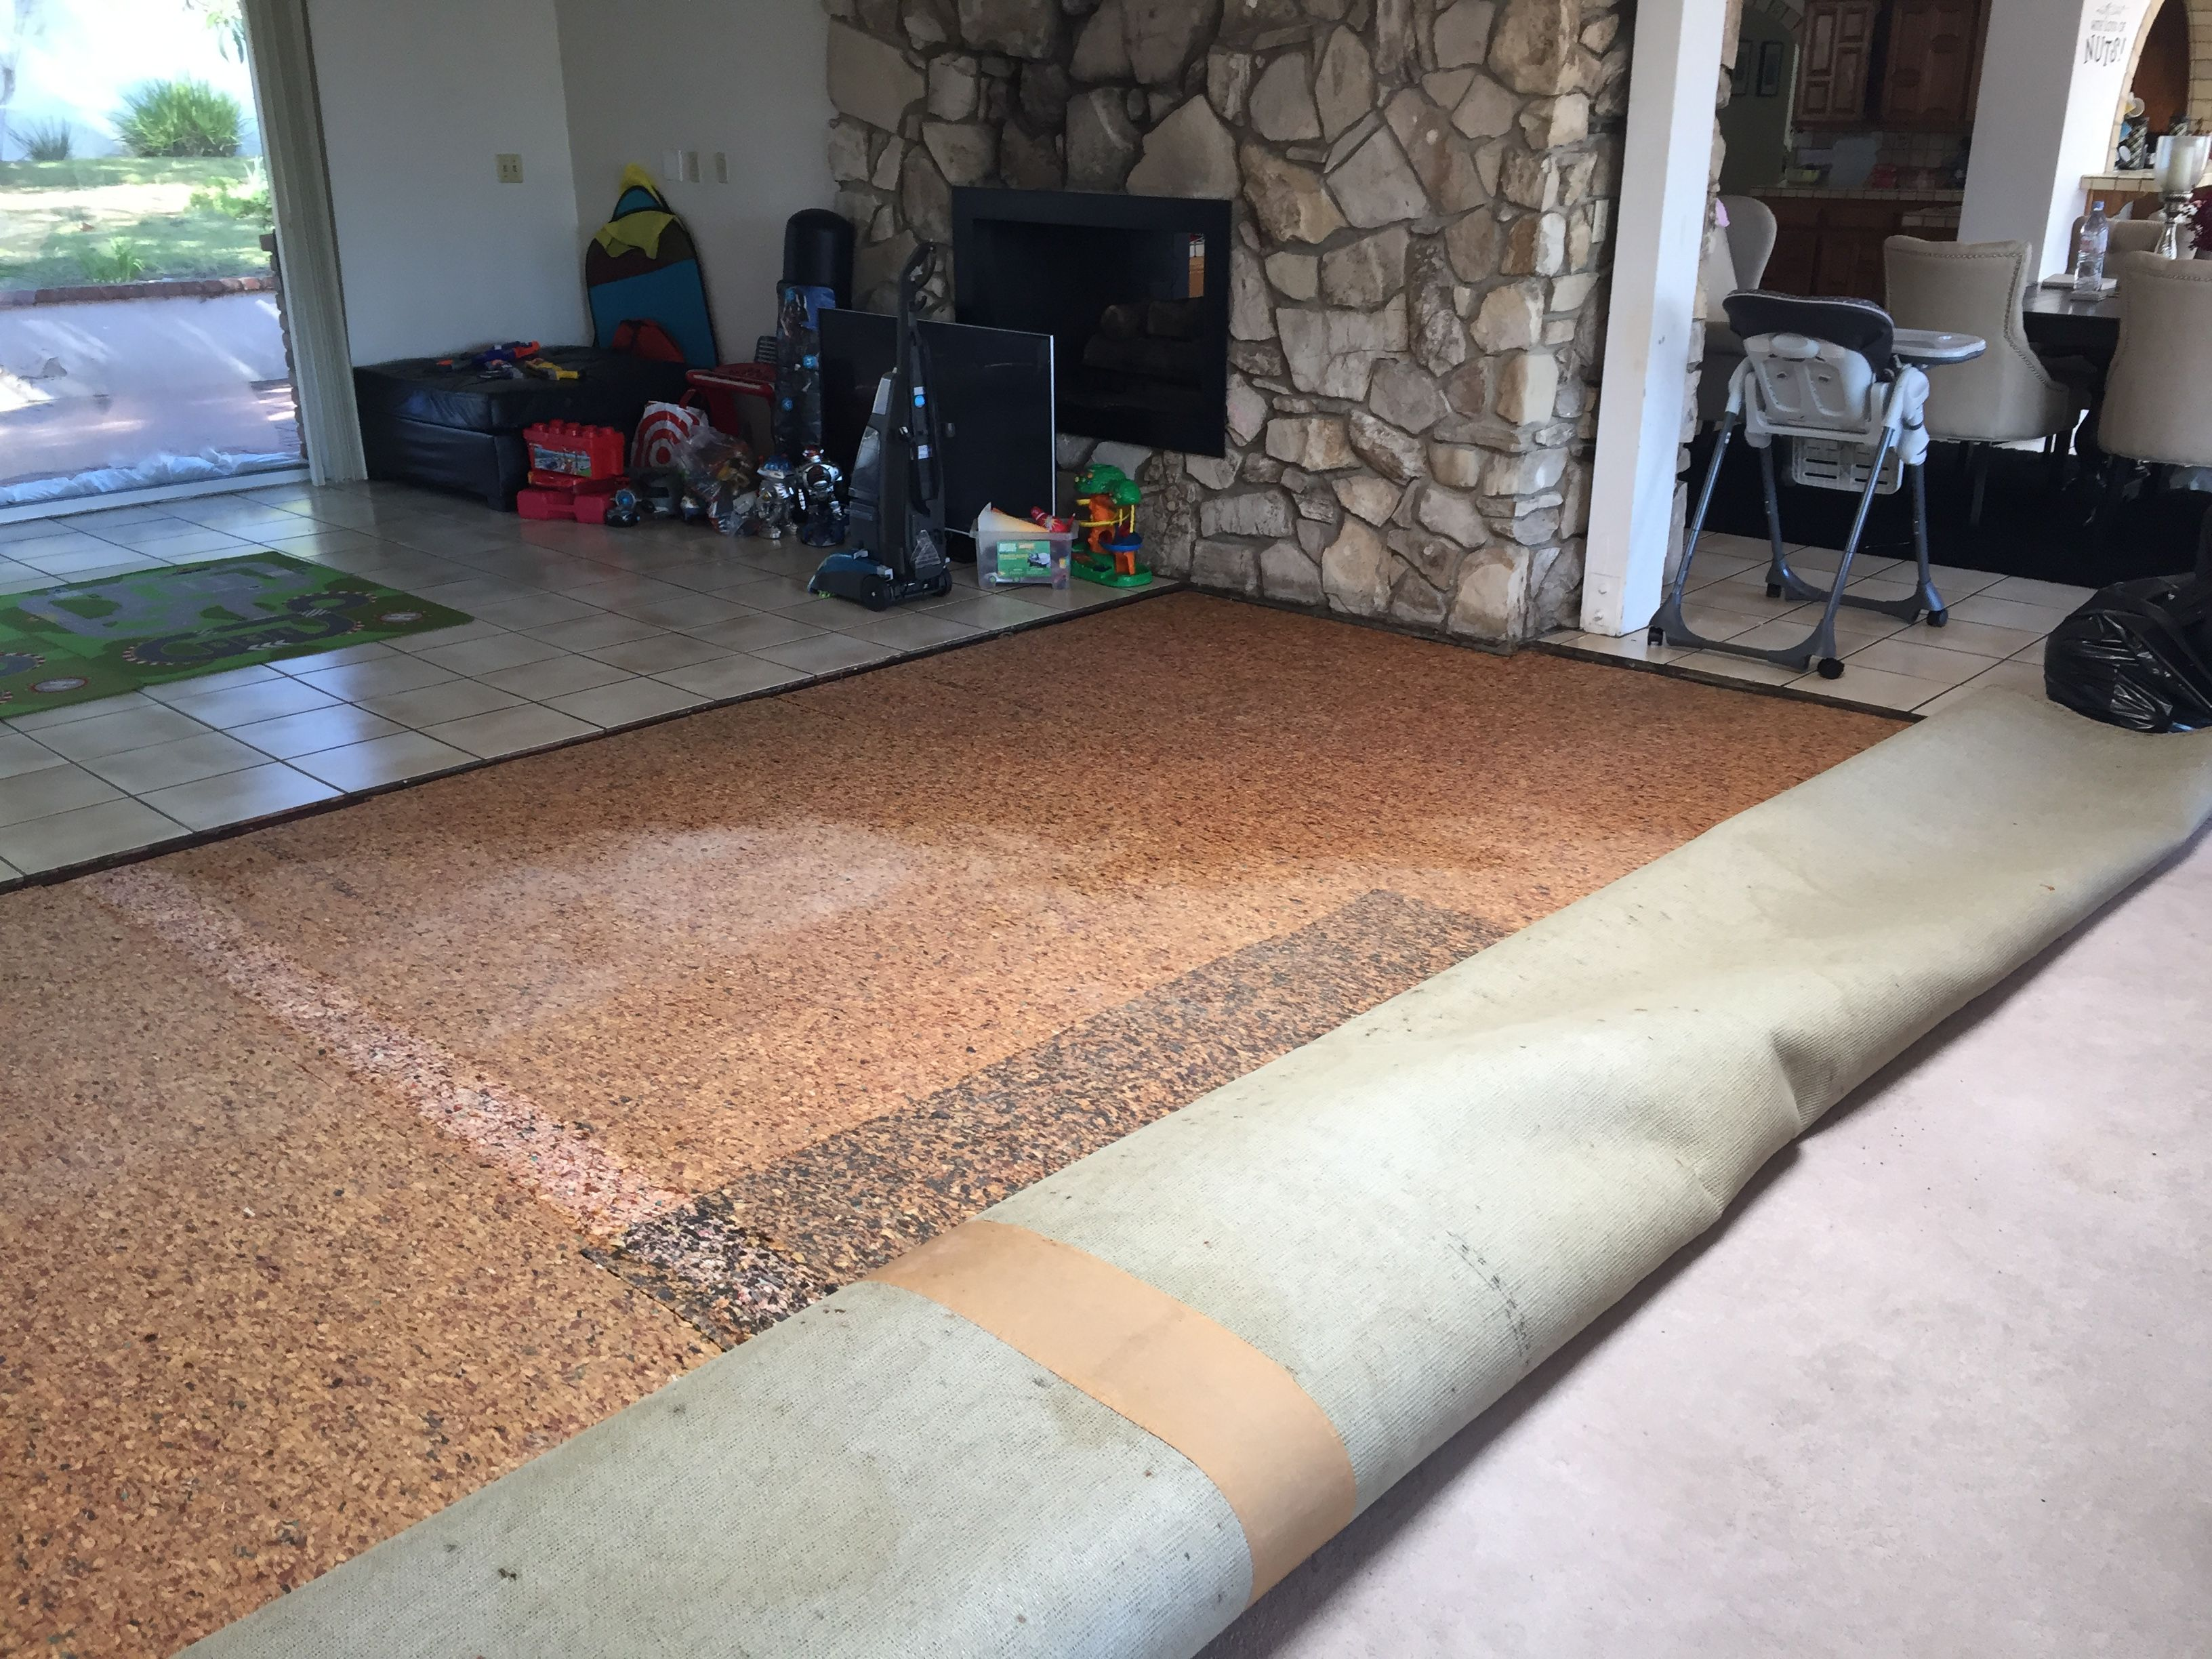 V&S Carpet and Flooring offers water damage restoration